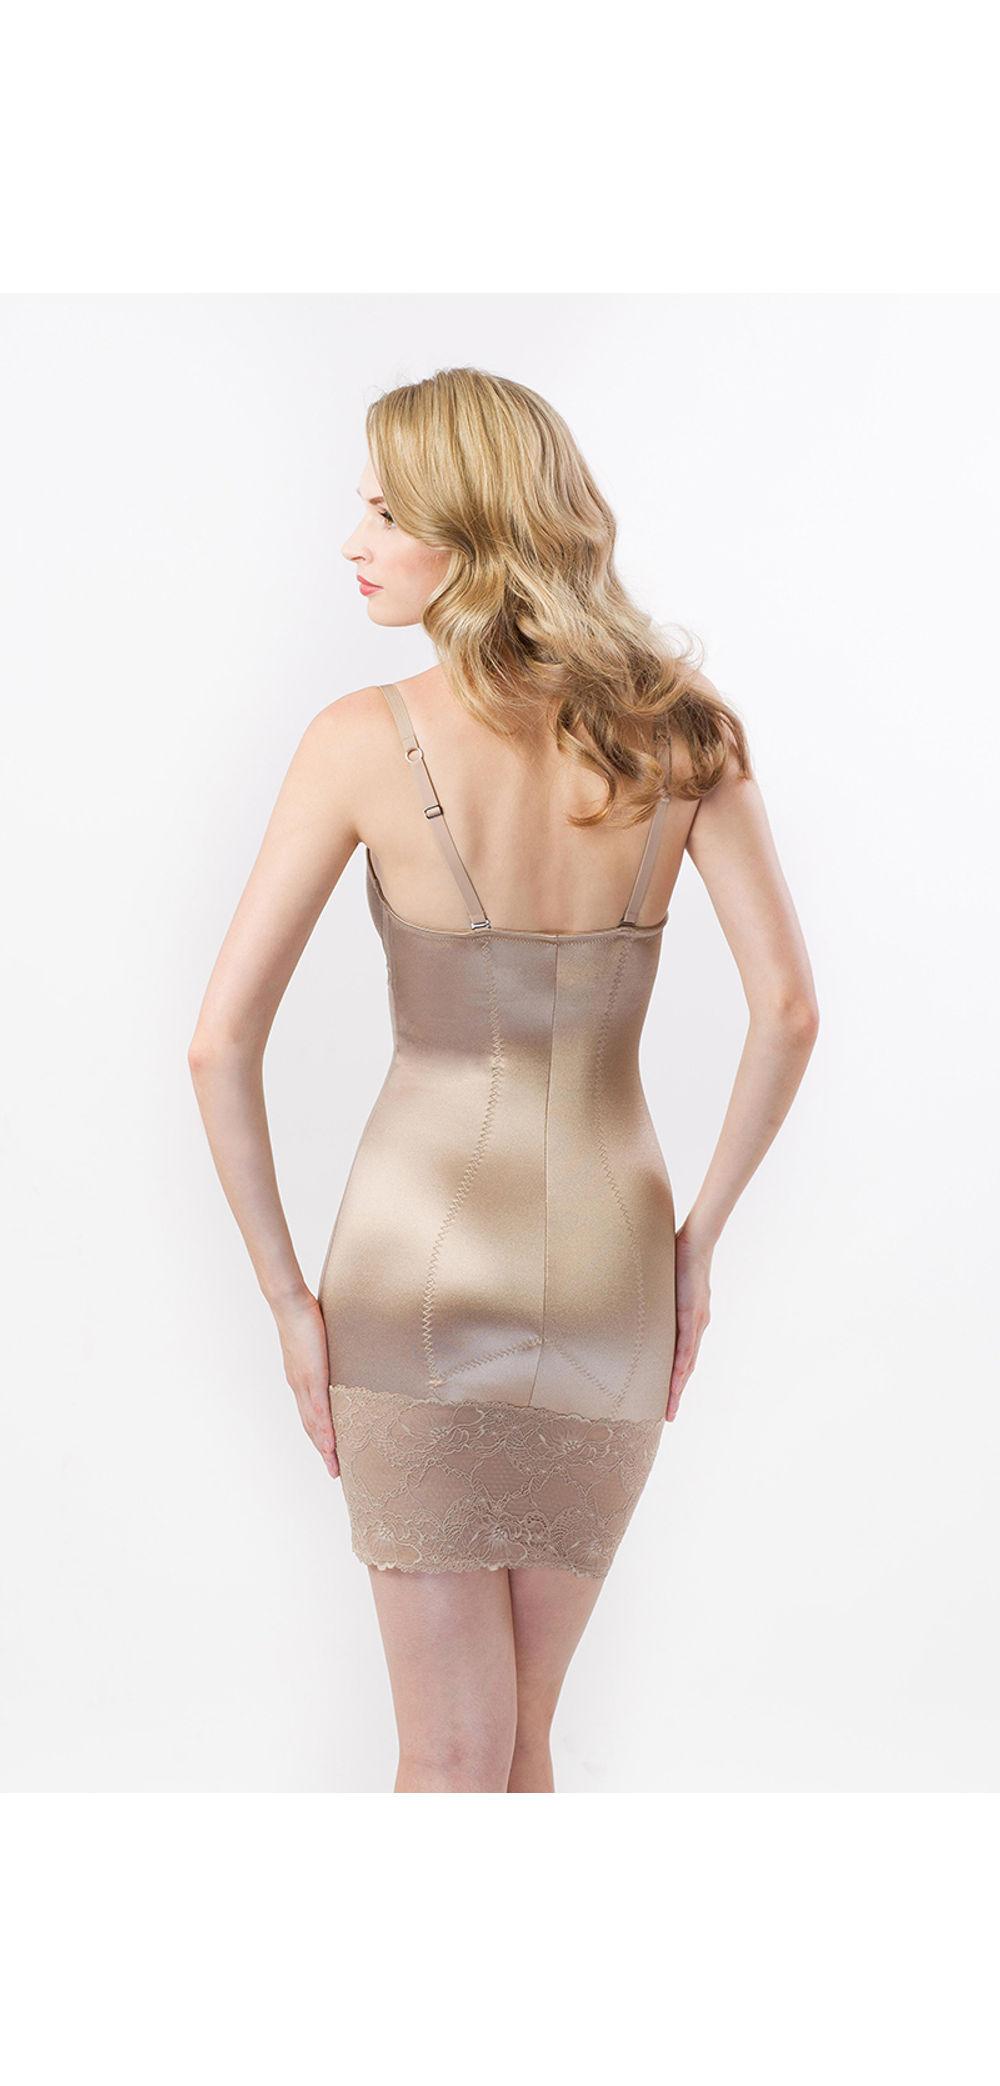 9140b7194c9d7 Scandale Champagne Gold Dress Shapewear